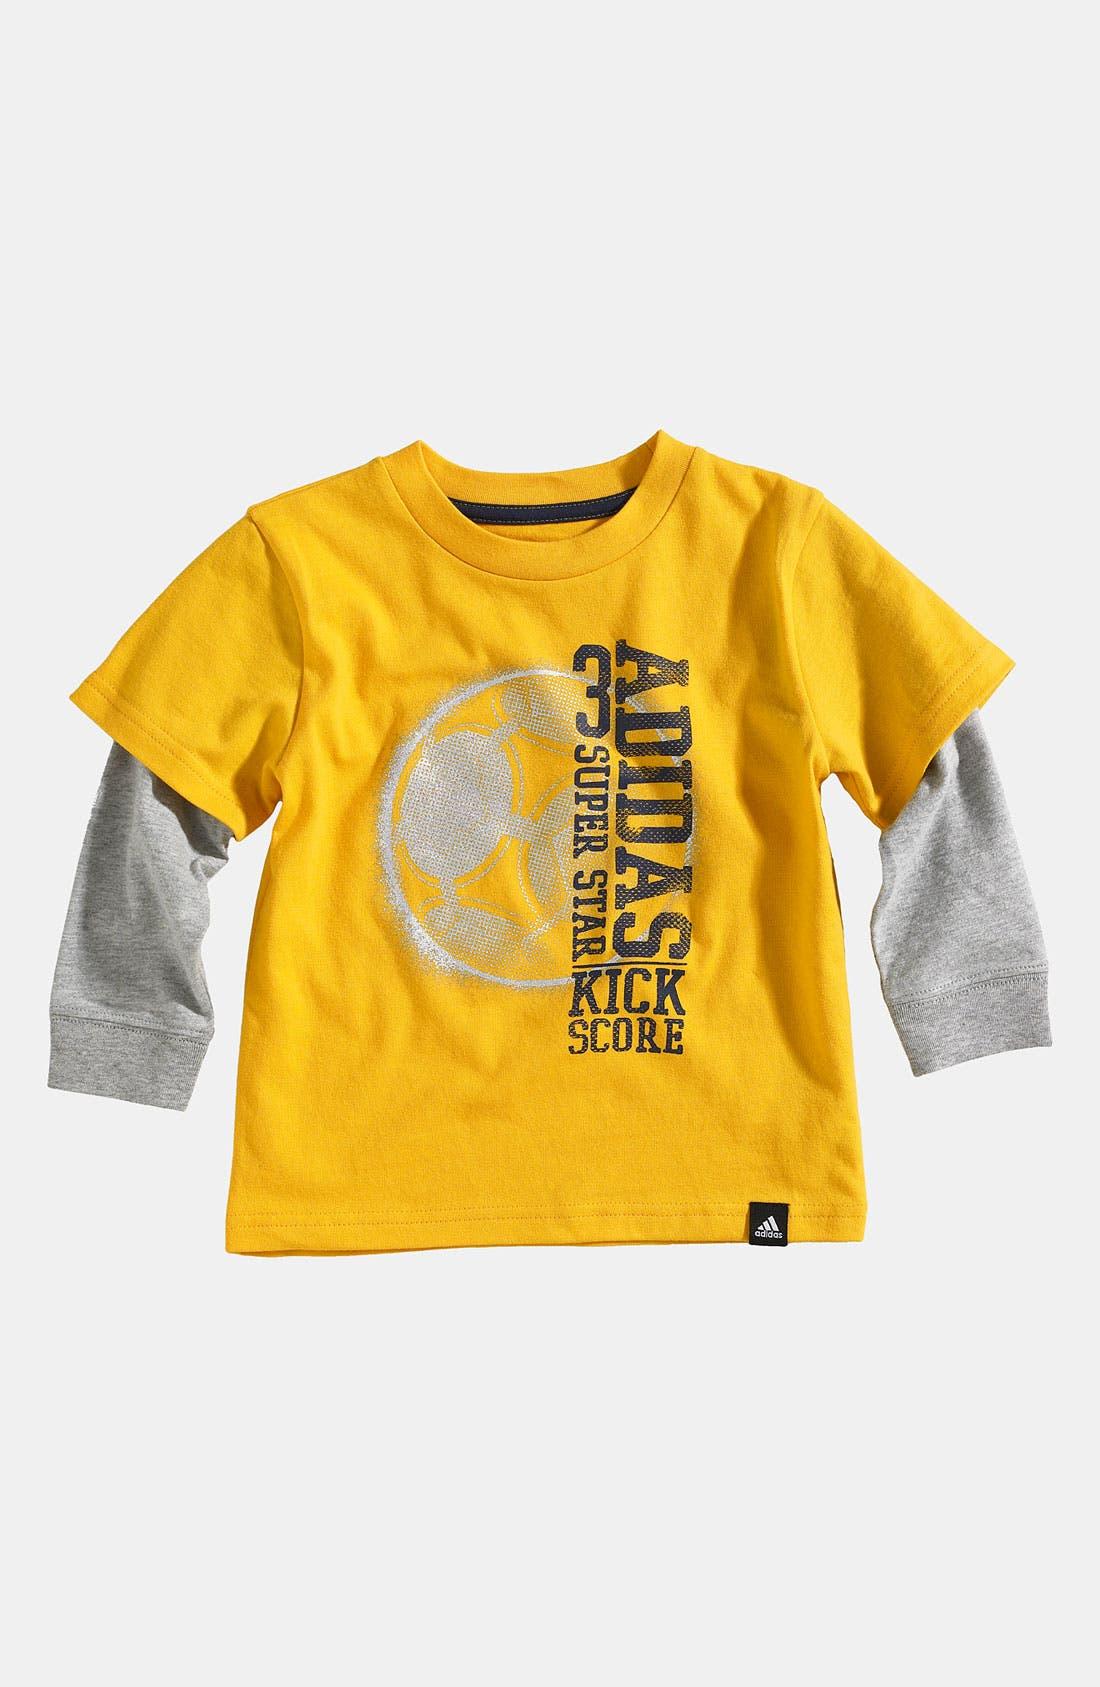 Alternate Image 1 Selected - adidas 'Triple Score' T-Shirt (Infant)